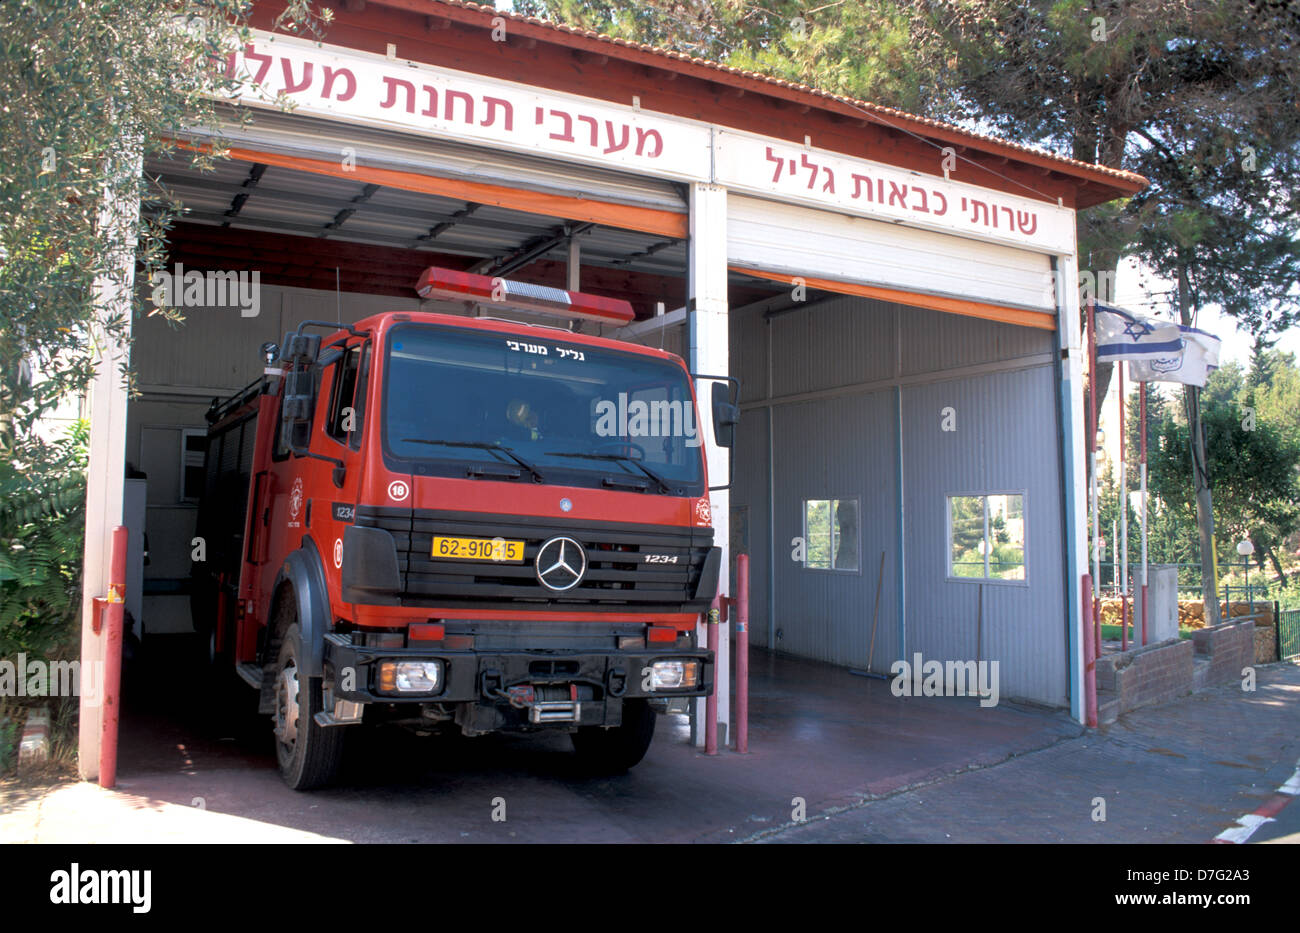 fire brigade unit of western galilee in maalot tarshiha - Stock Image